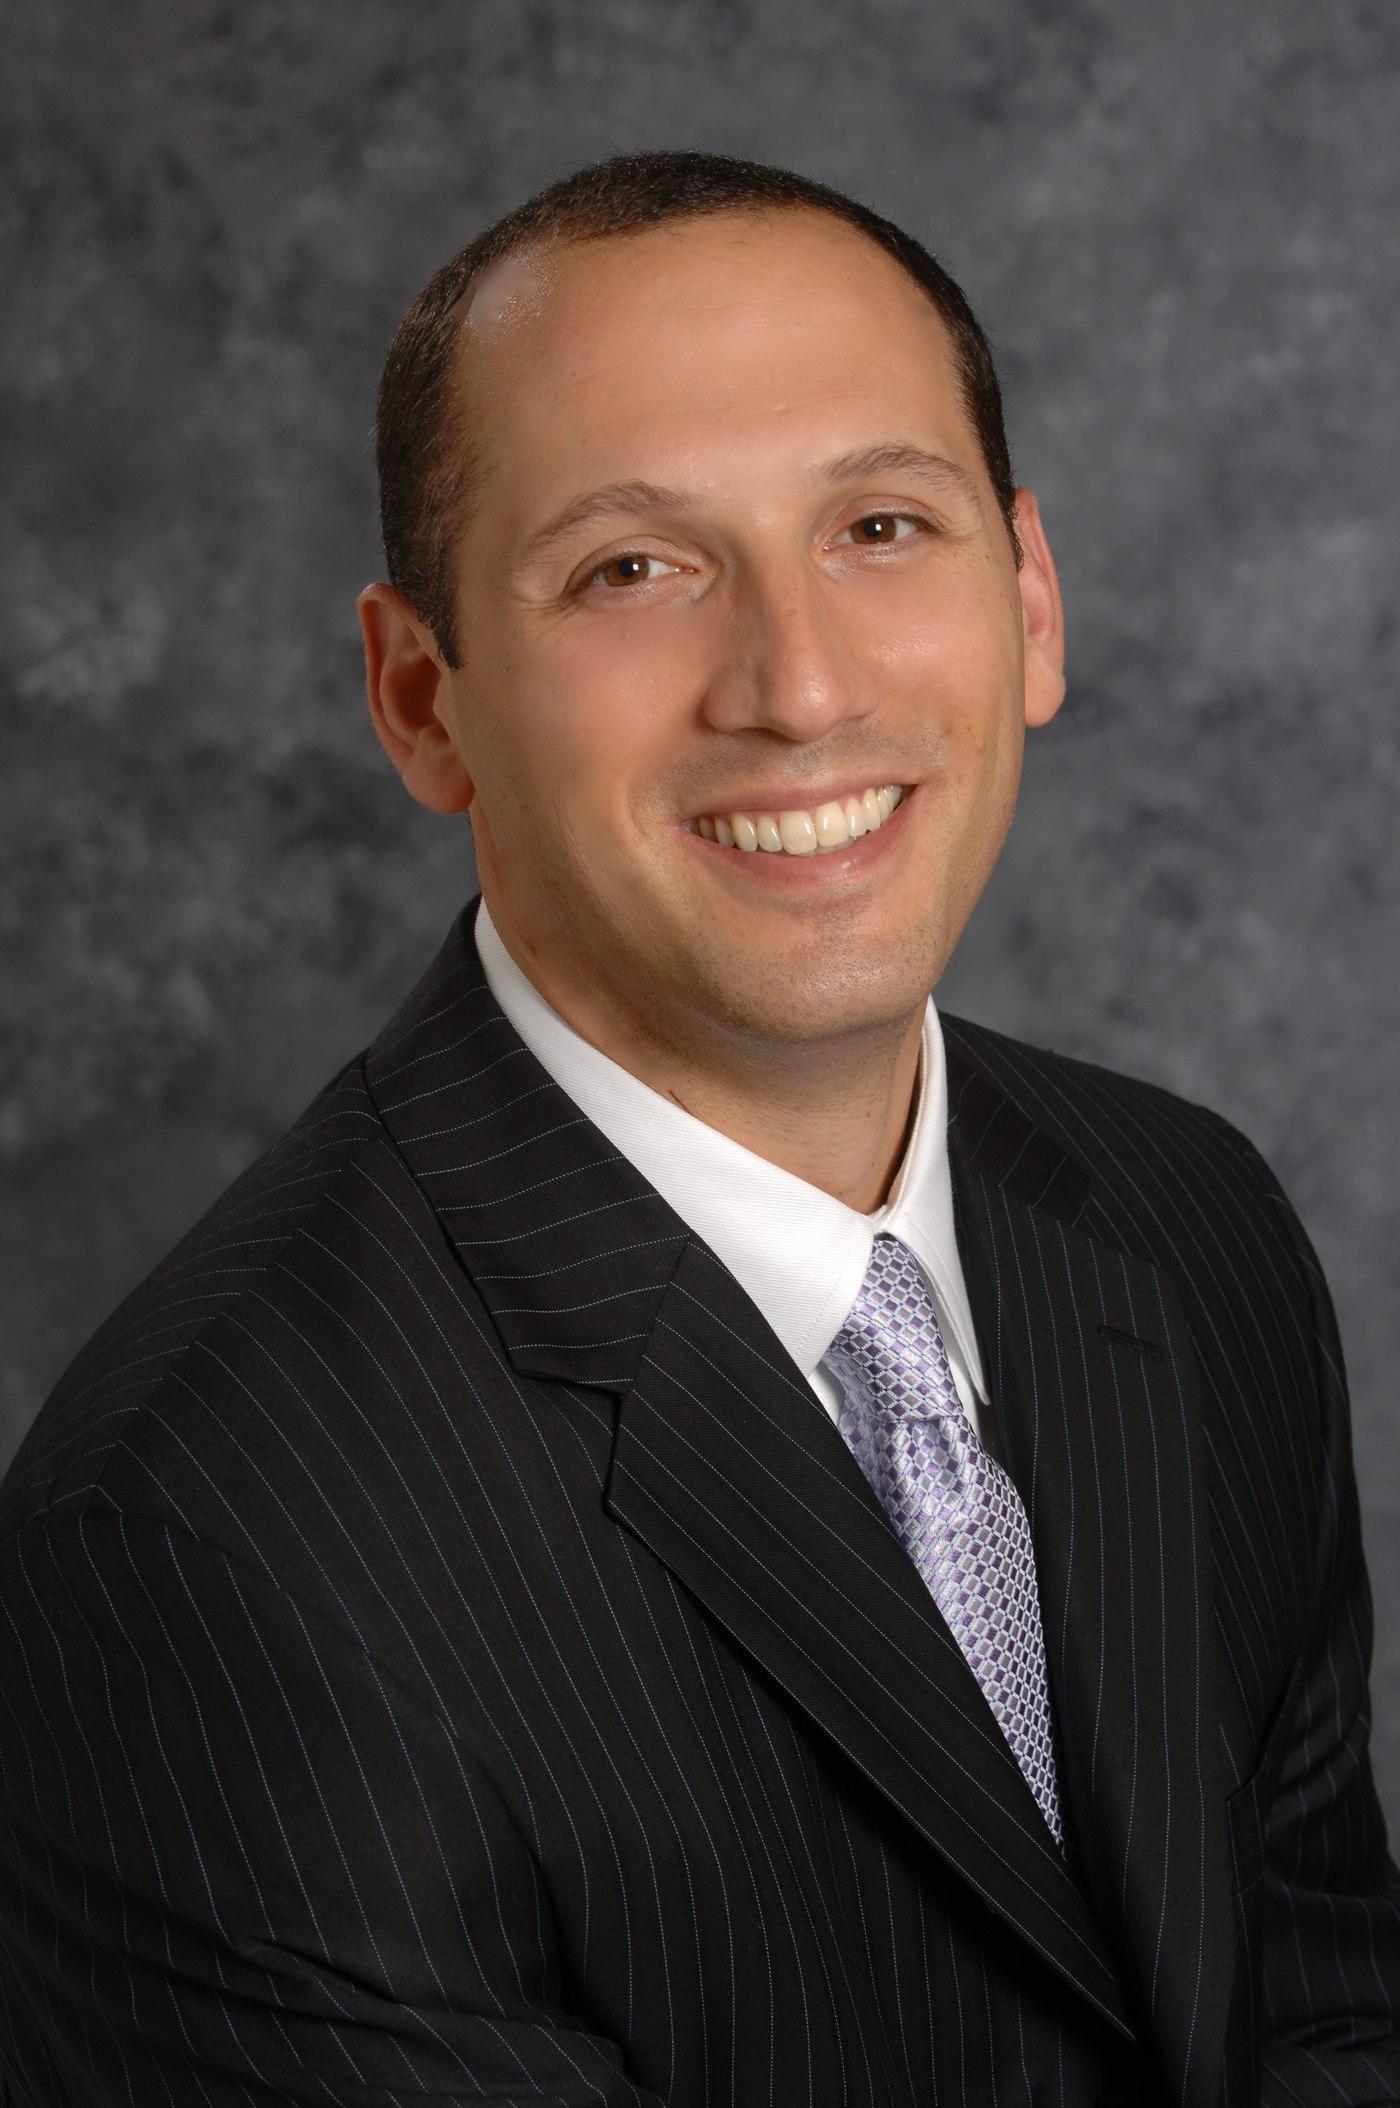 Fertility Doctor Joshua M. Hurwitz, MD